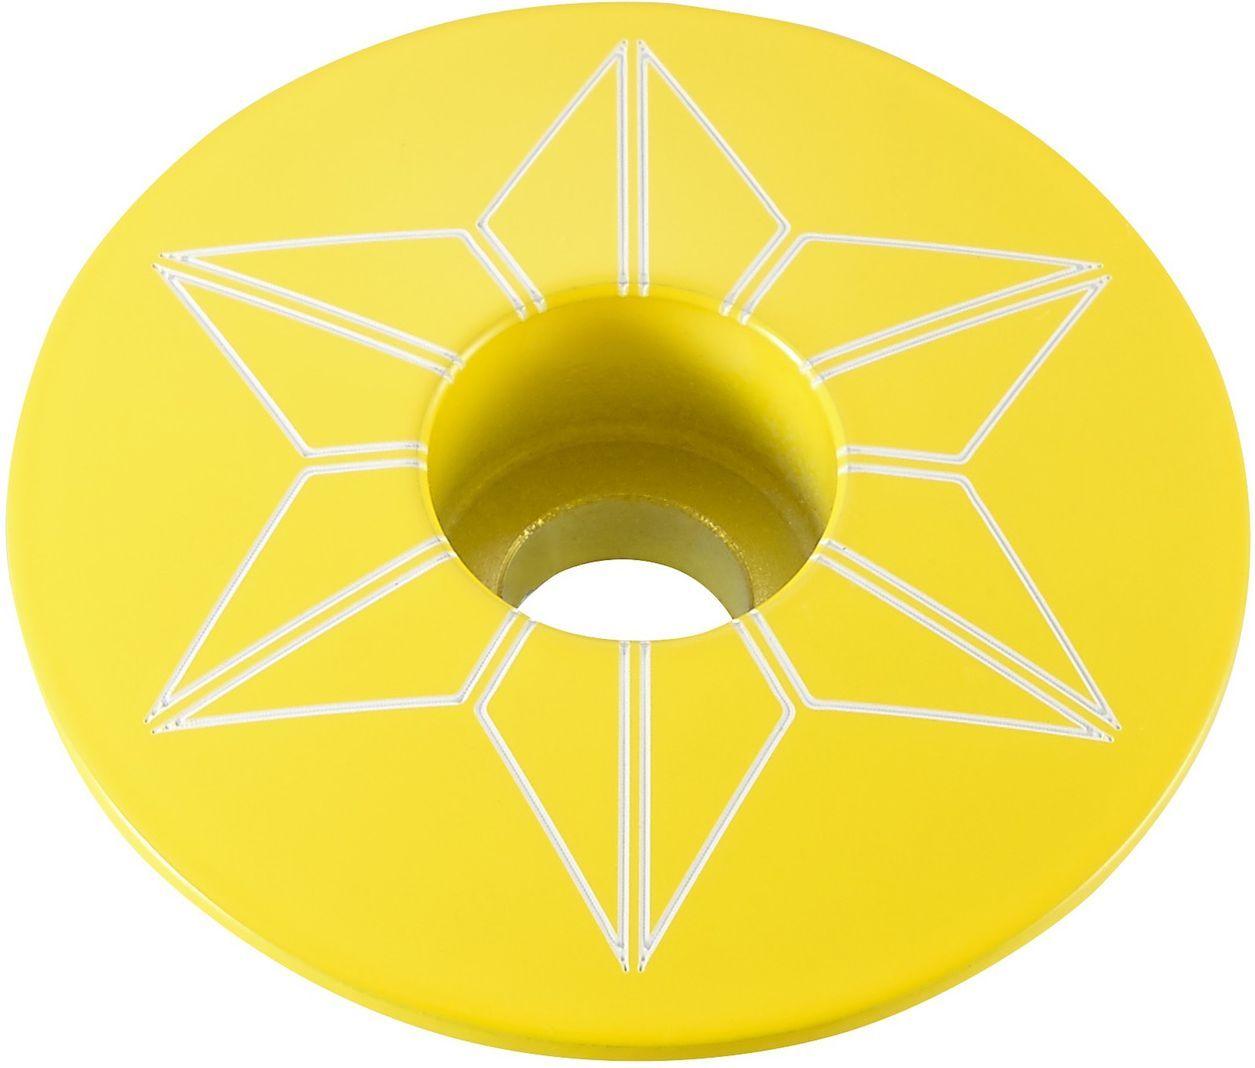 Supacaz Star Capz - Powder Coated - TDF Yellow (powder coated) uni